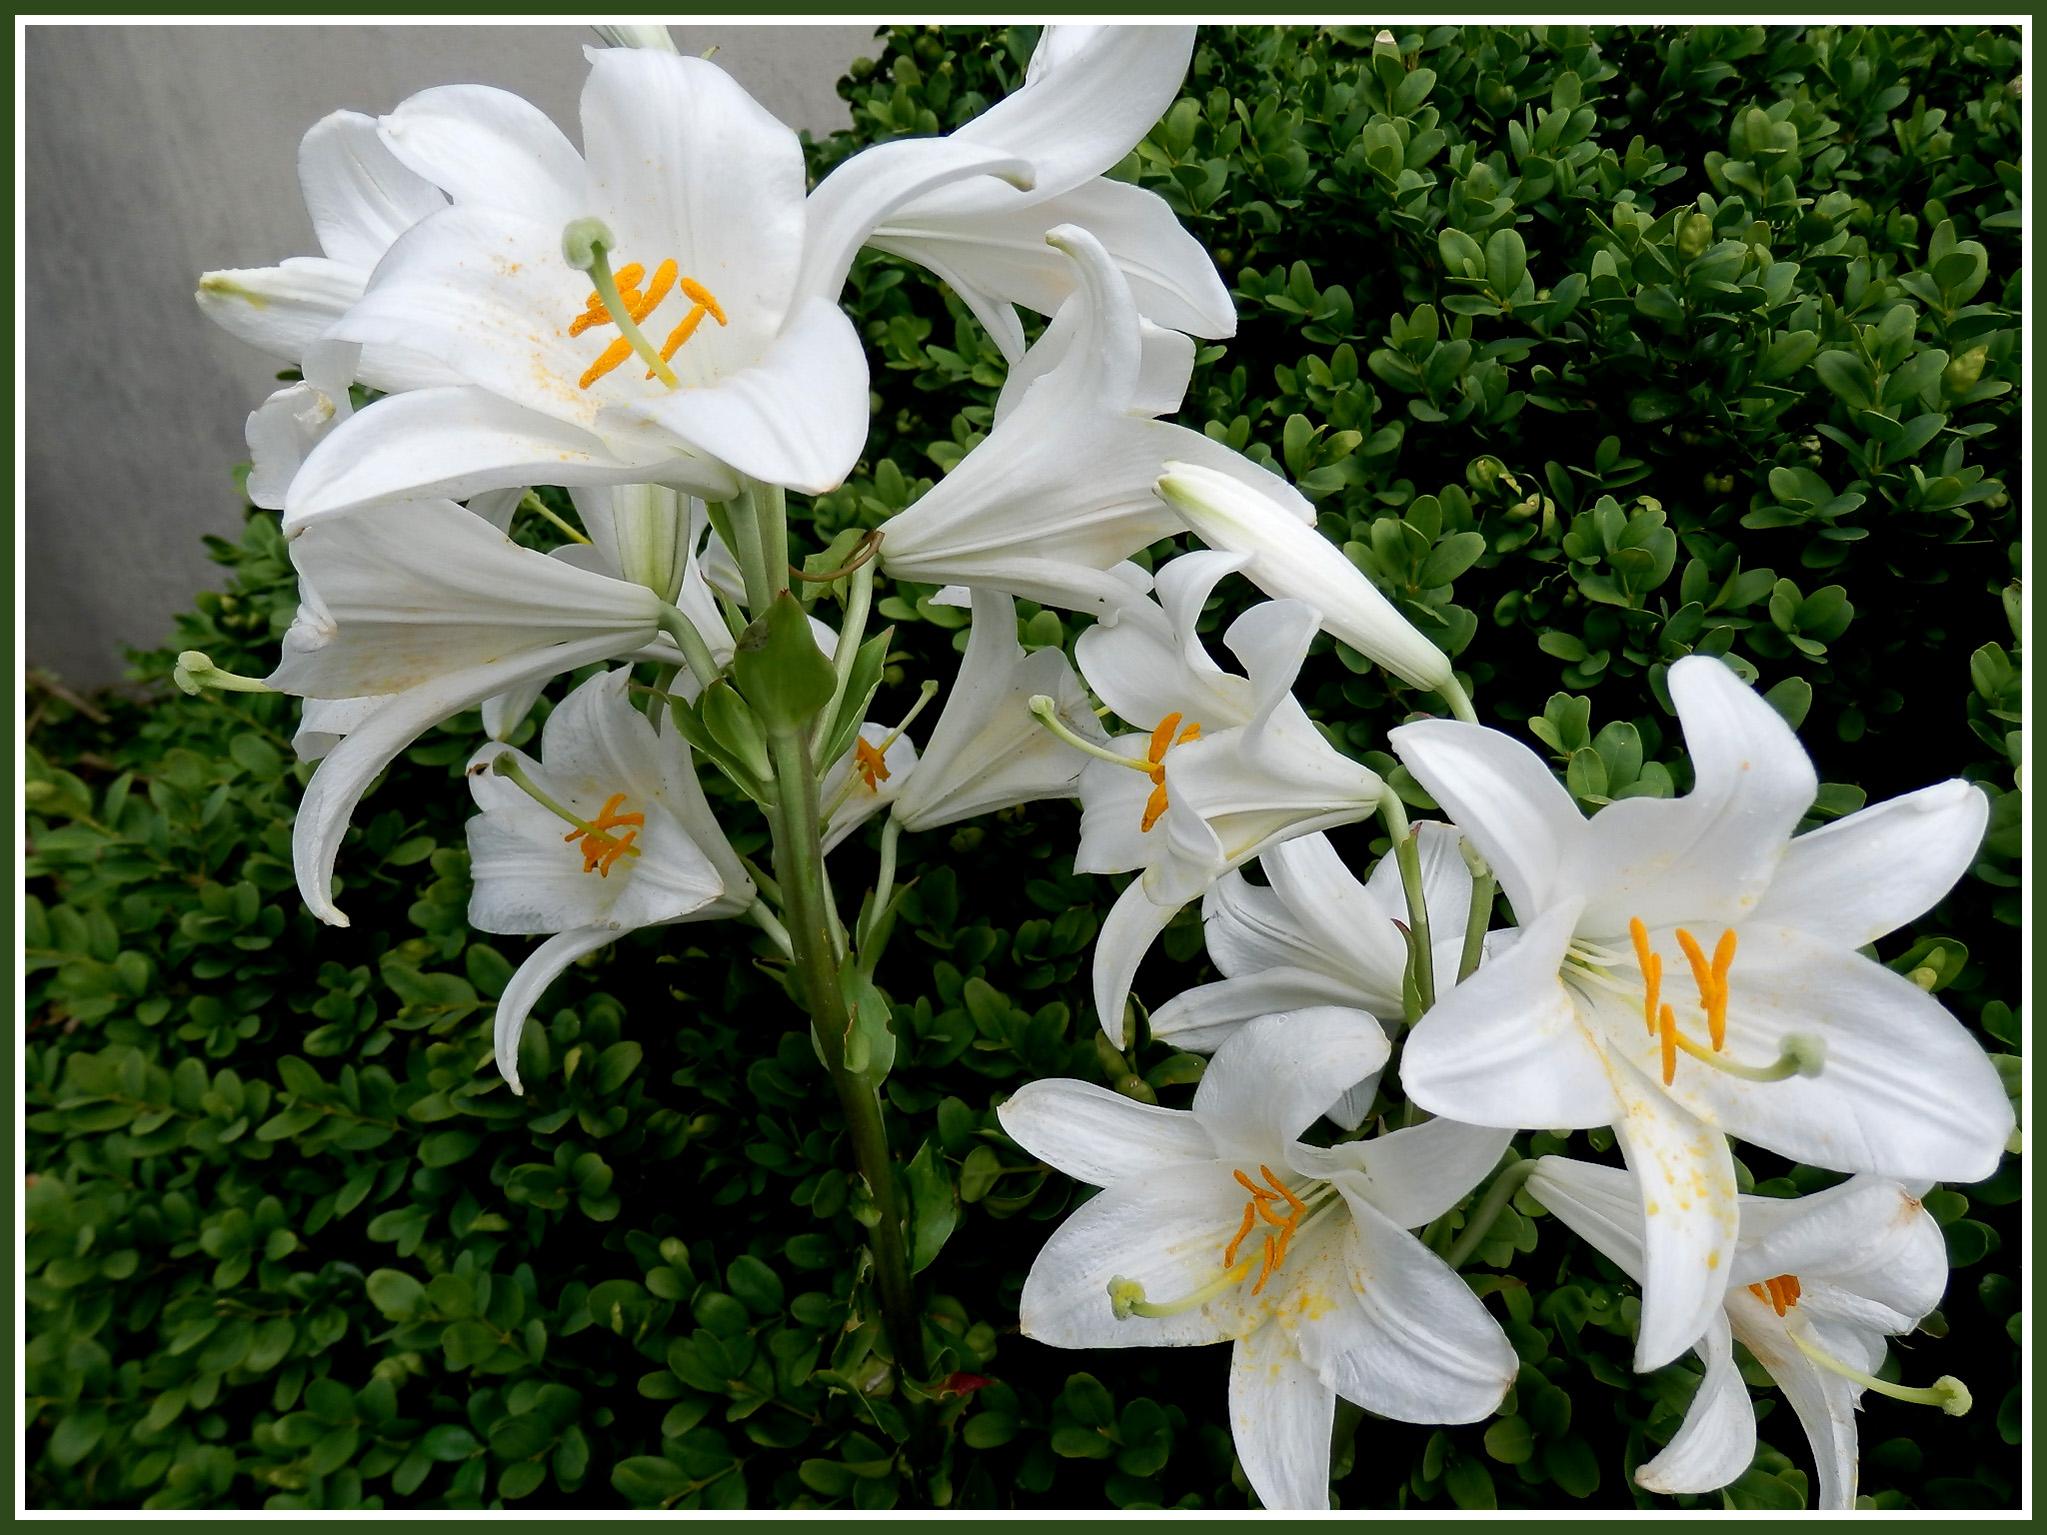 fleurs d 39 t diverses volet 4 magnolia roses images gratuites fotofree. Black Bedroom Furniture Sets. Home Design Ideas